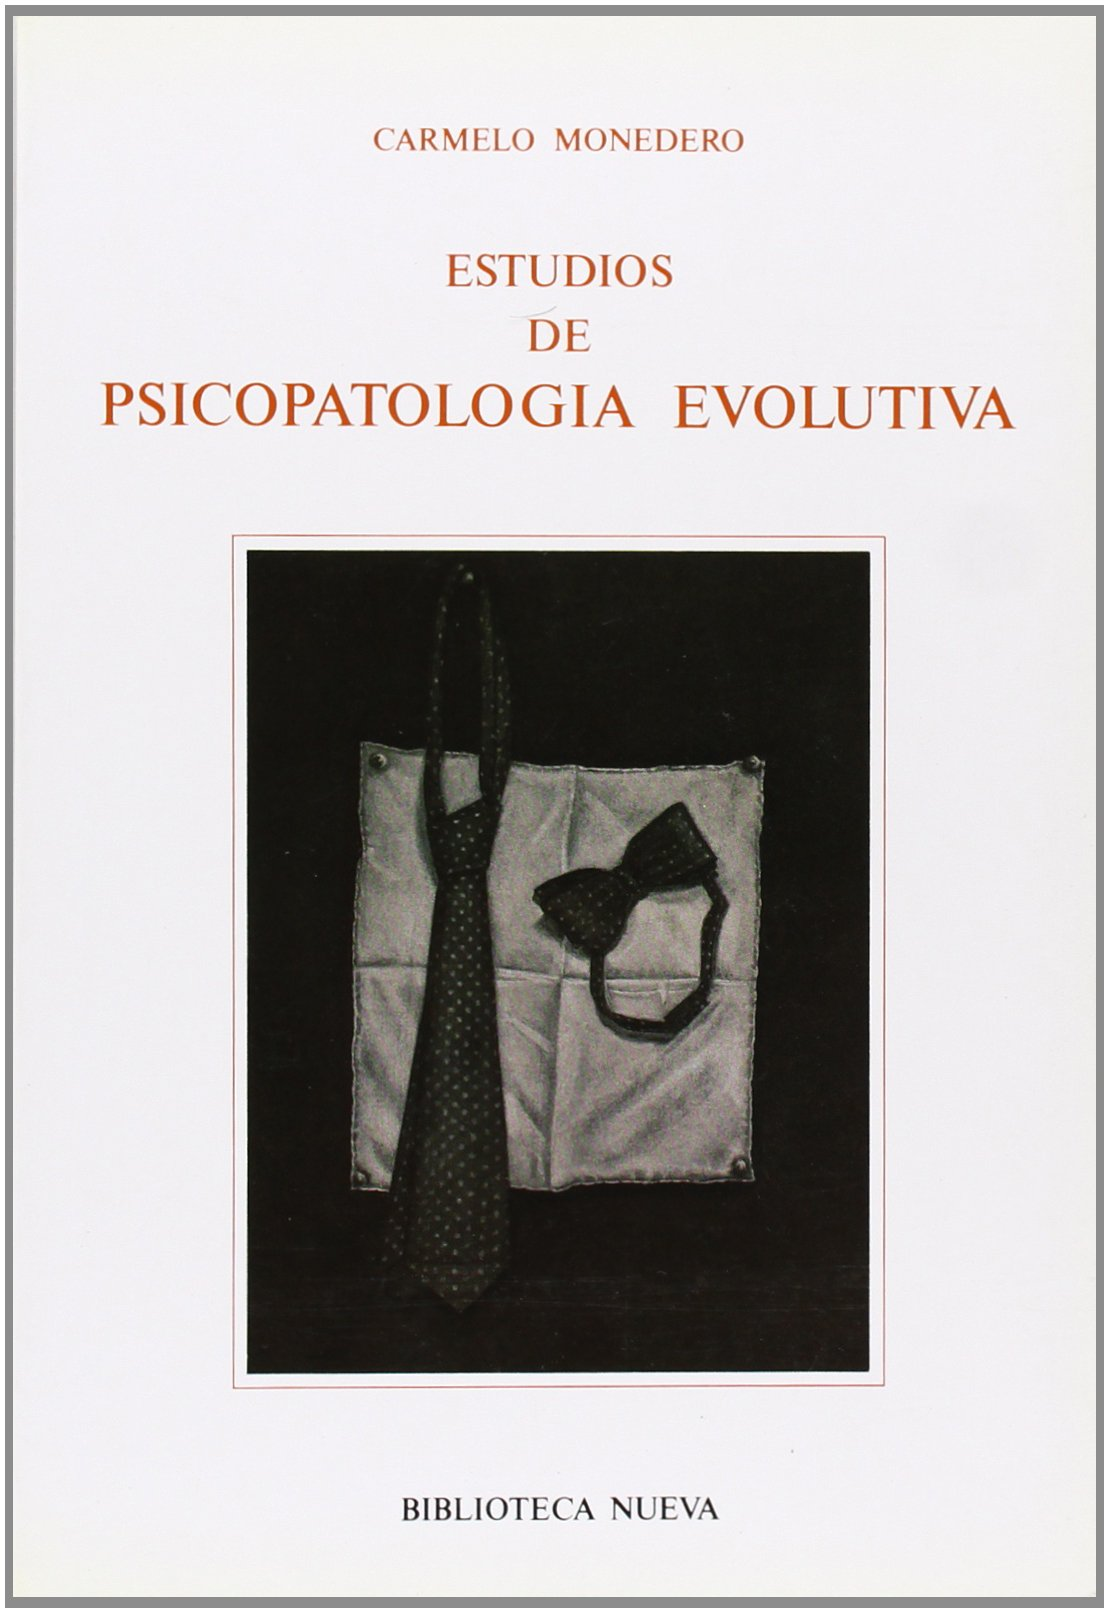 Estudios de psicopatología evolutiva: CARMELO MONEDERO ...